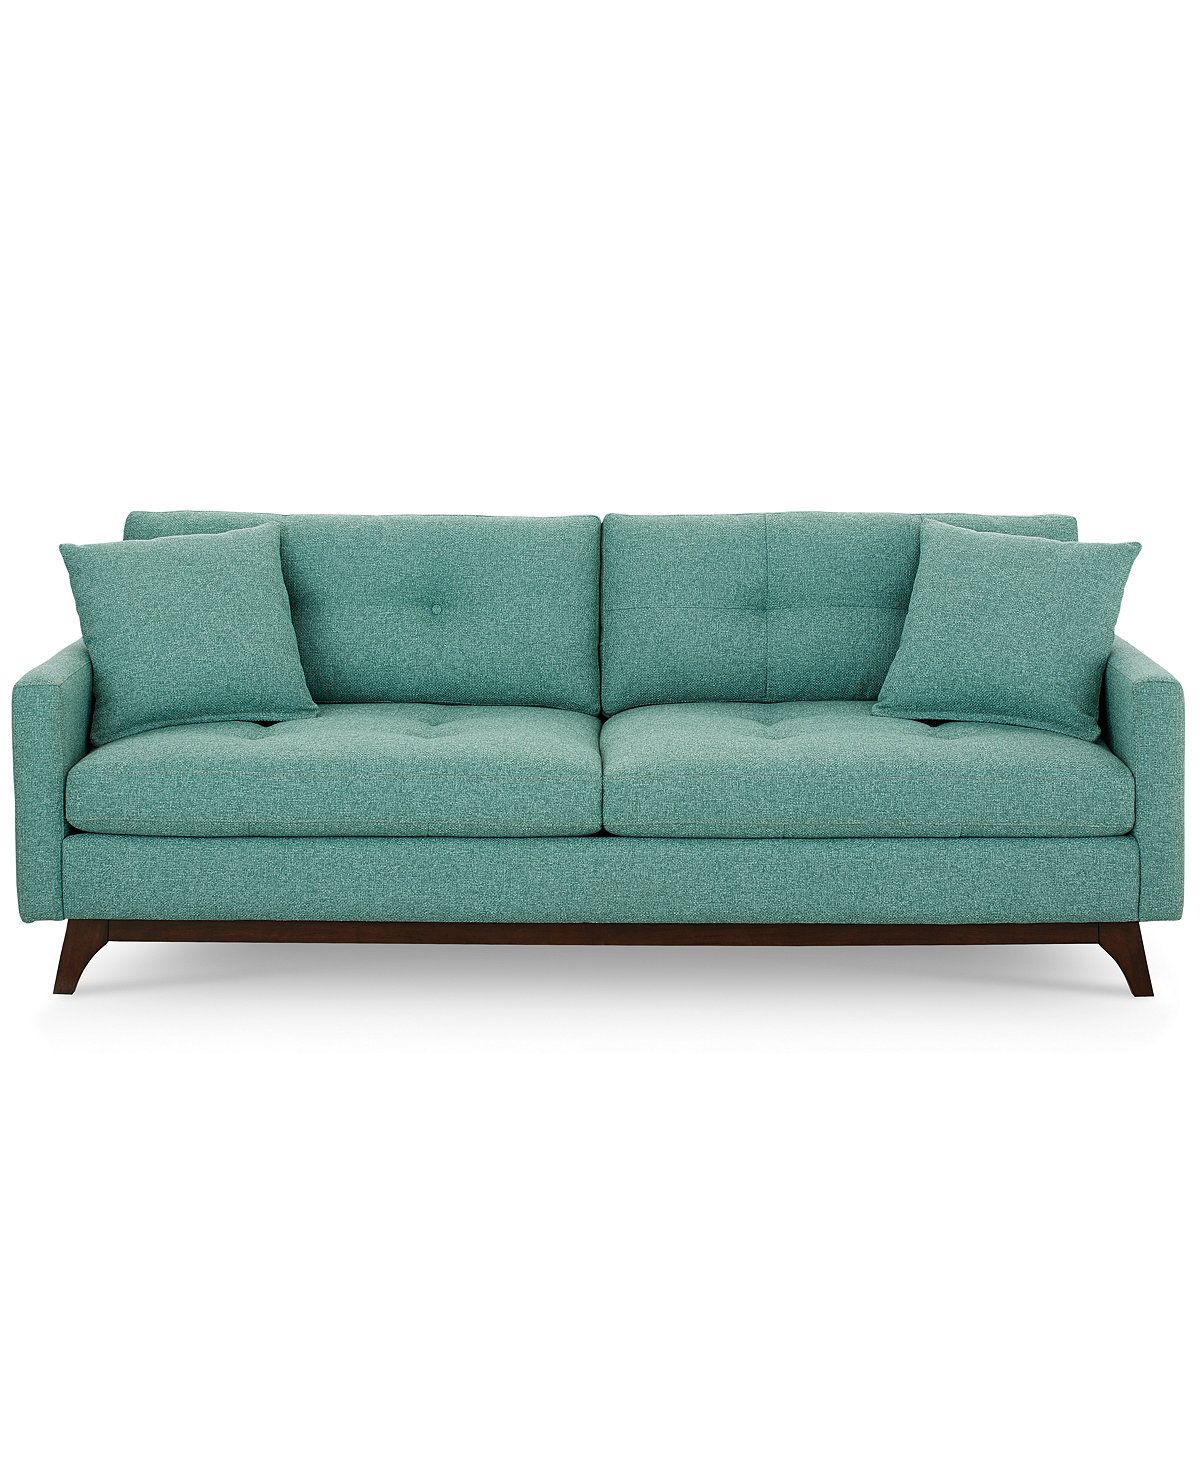 Taupe Tufted Nail Head Myles Sofa Cheap Couch Sofa Simple Sofa